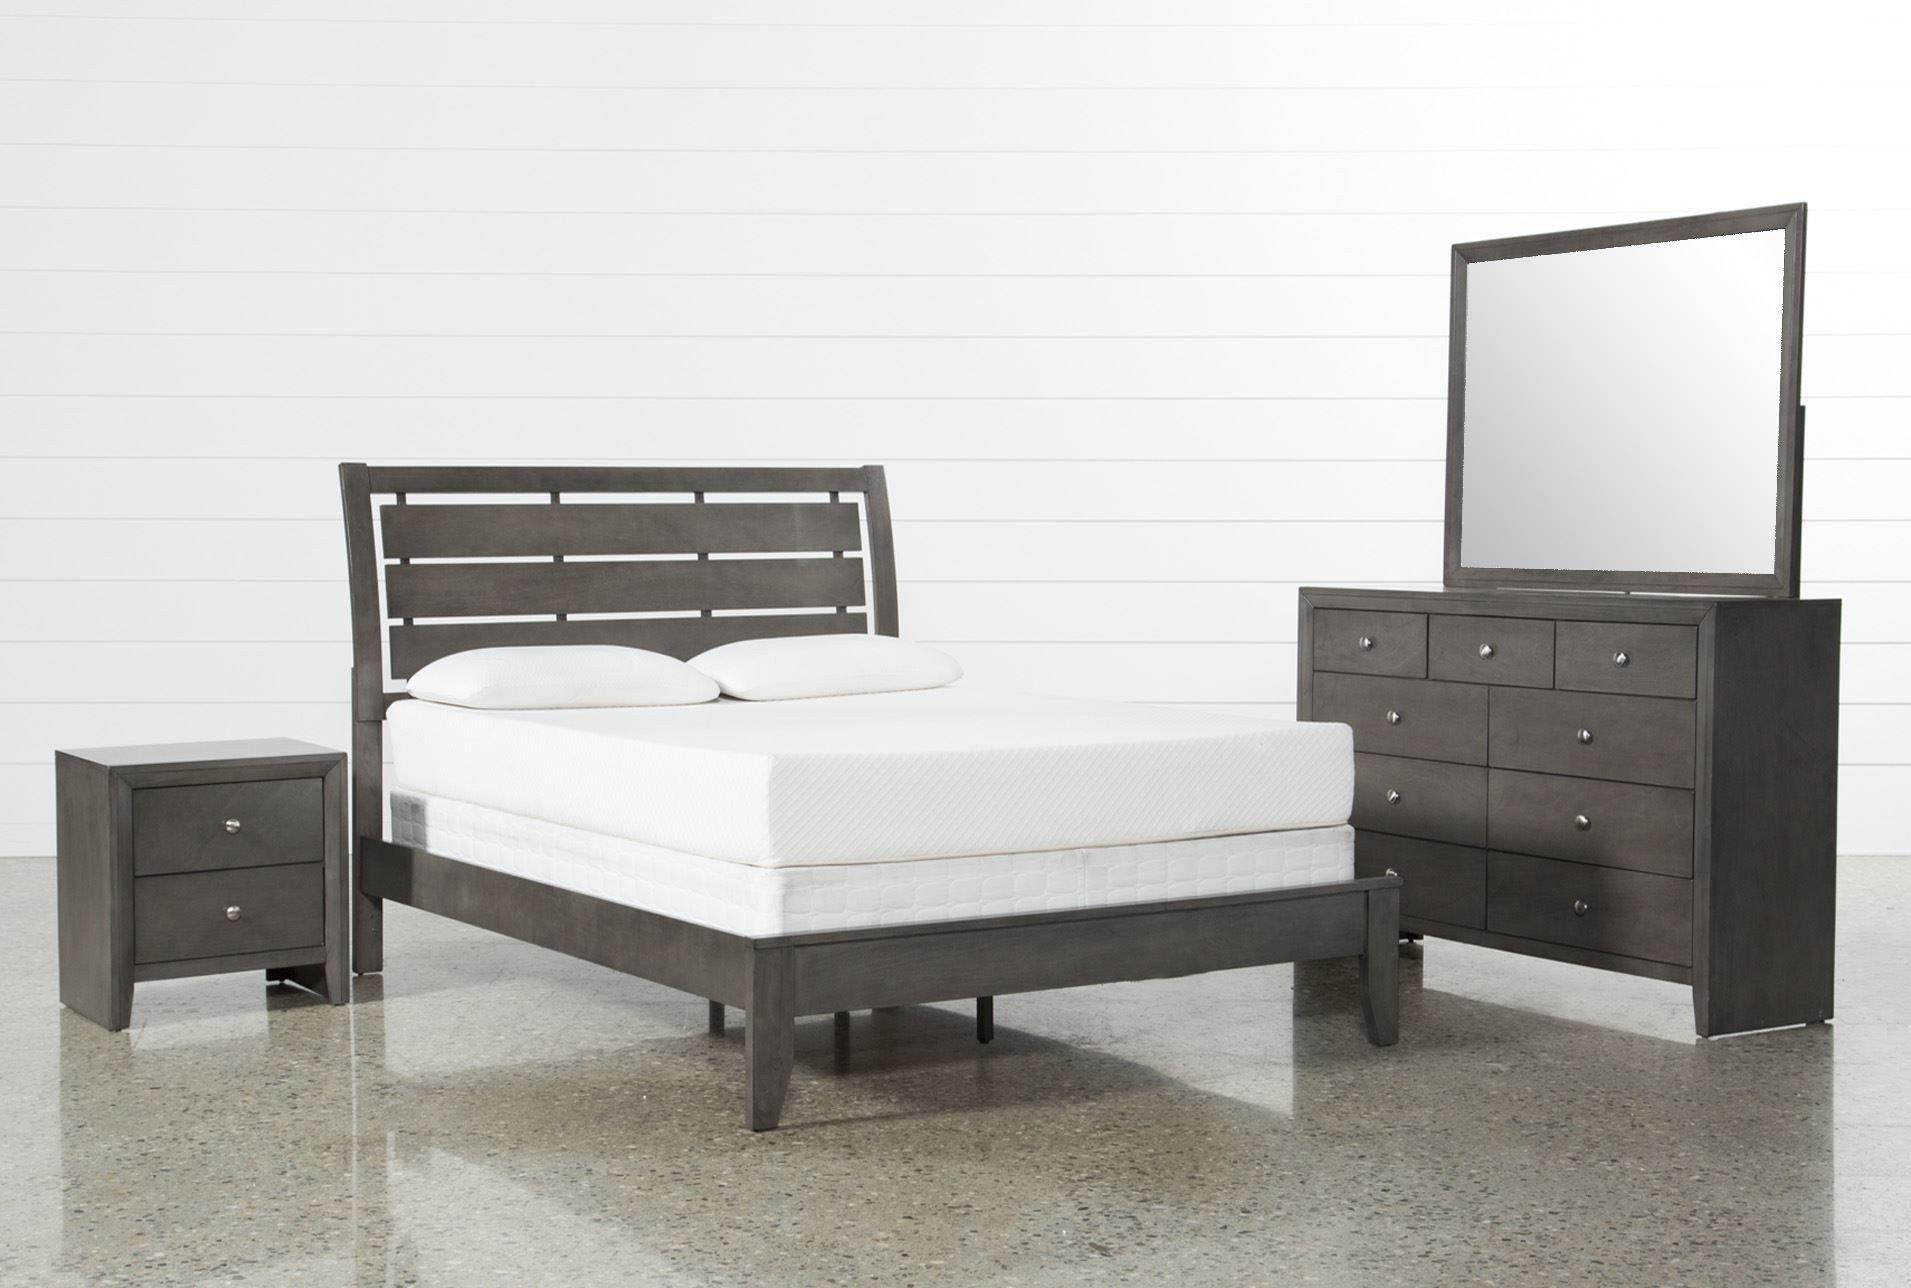 4 Piece Bedroom Set Fresh Grey Eastern King 4 Piece Bedroom Set Chad